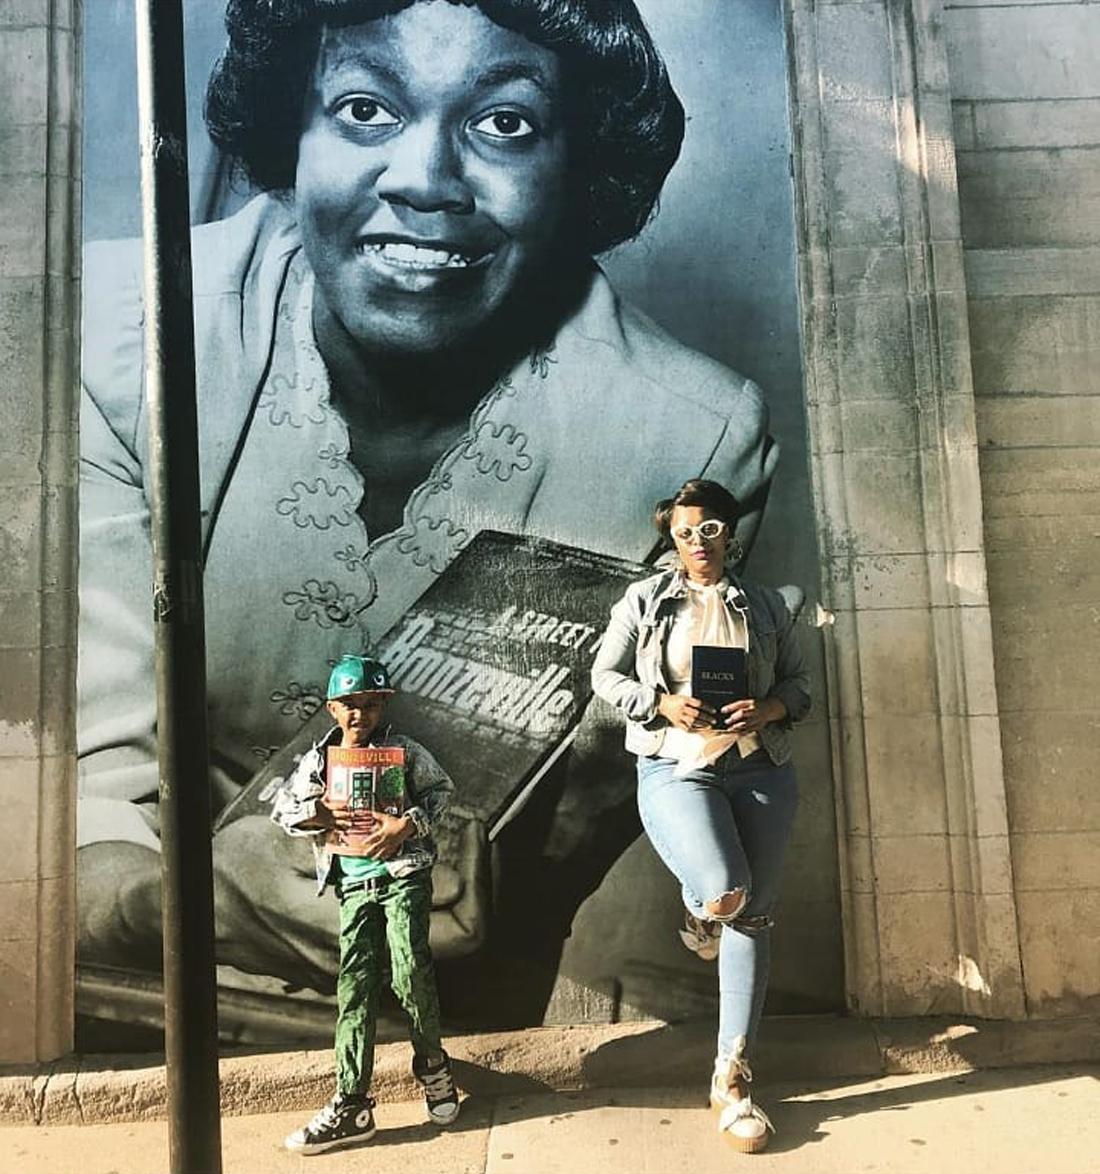 gwen brooks mural selfie chississippi mixtape large cropped copy.jpg